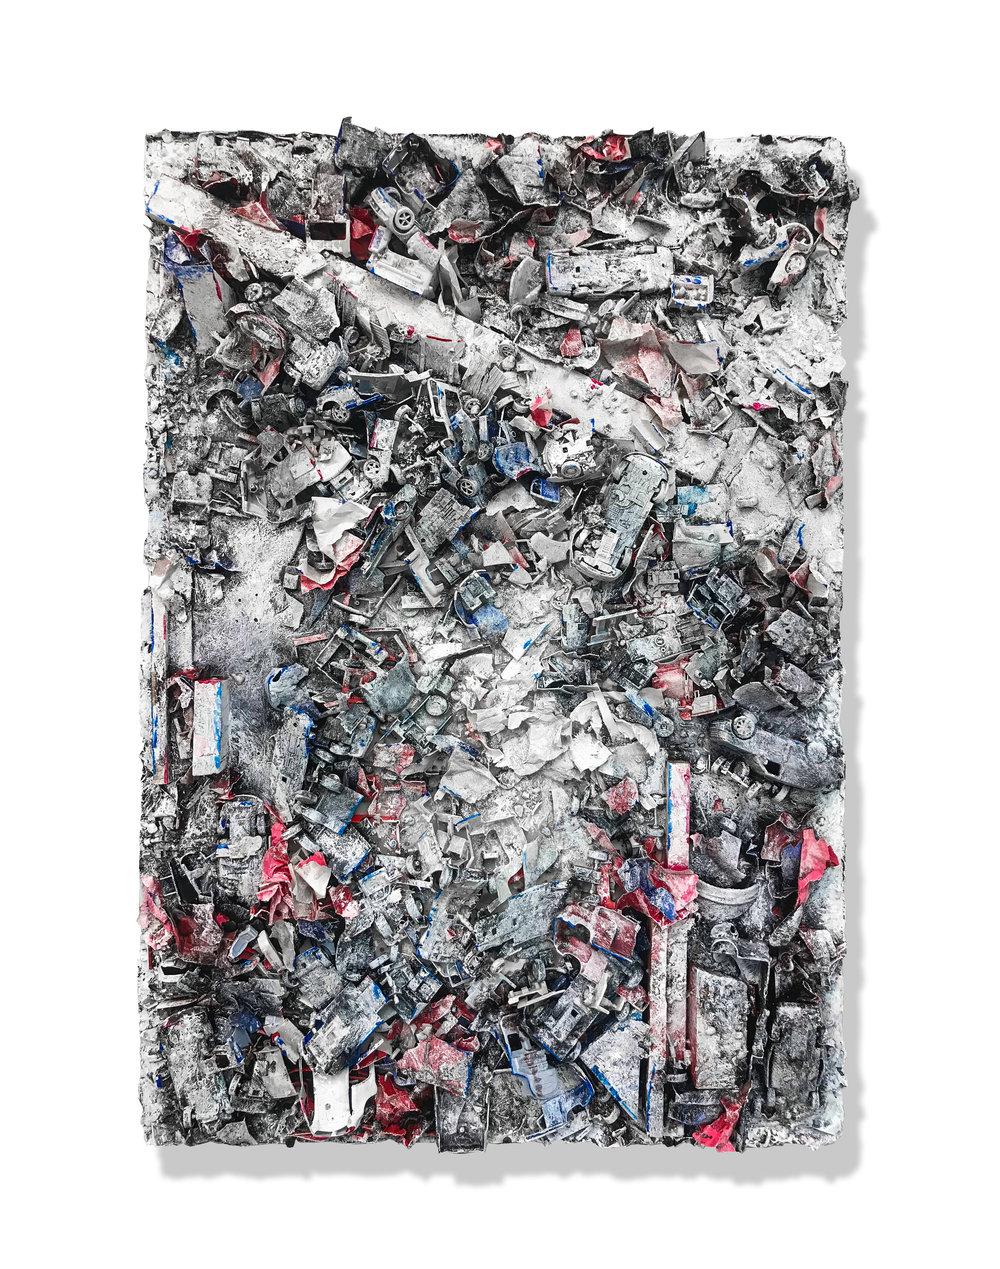 Untitled, 2018  ( Remnants  Series): archival pigment print